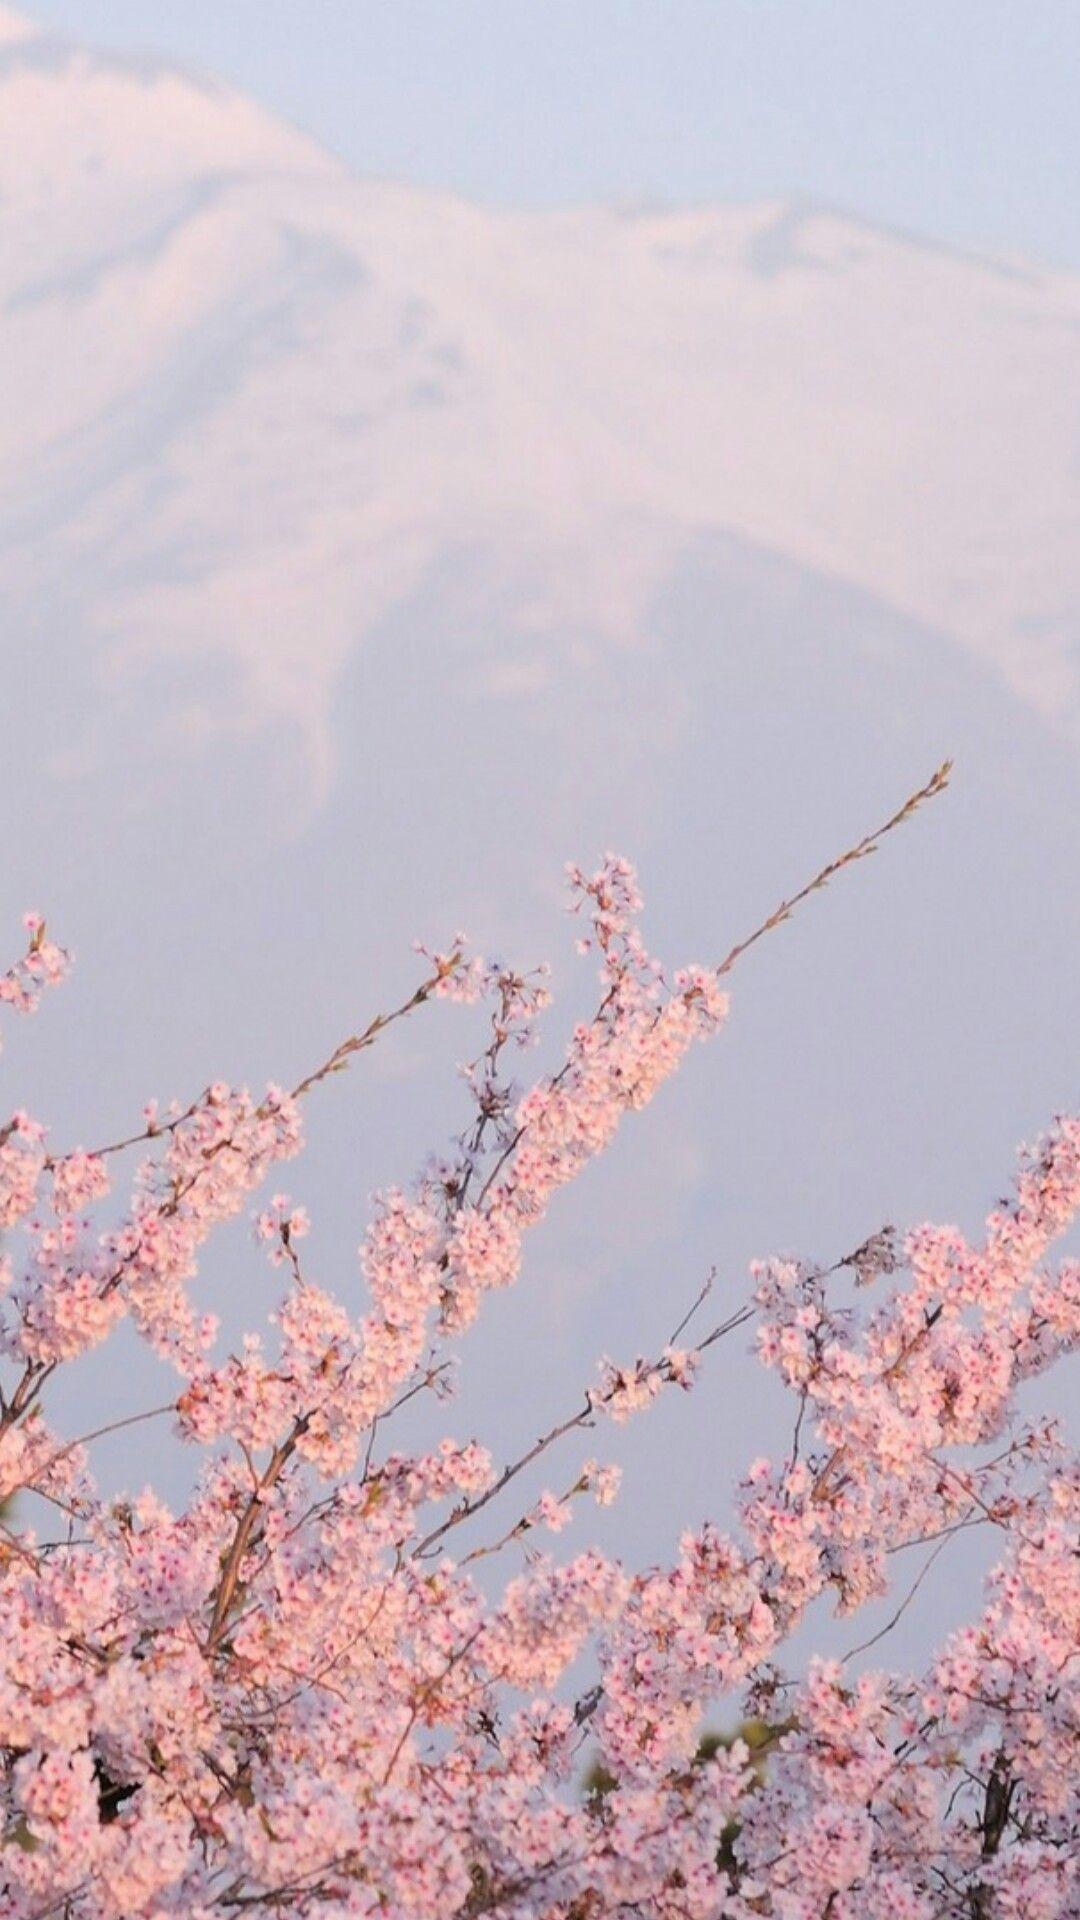 Sackgasse Aesthetic Backgrounds Pink Aesthetic Flower Aesthetic